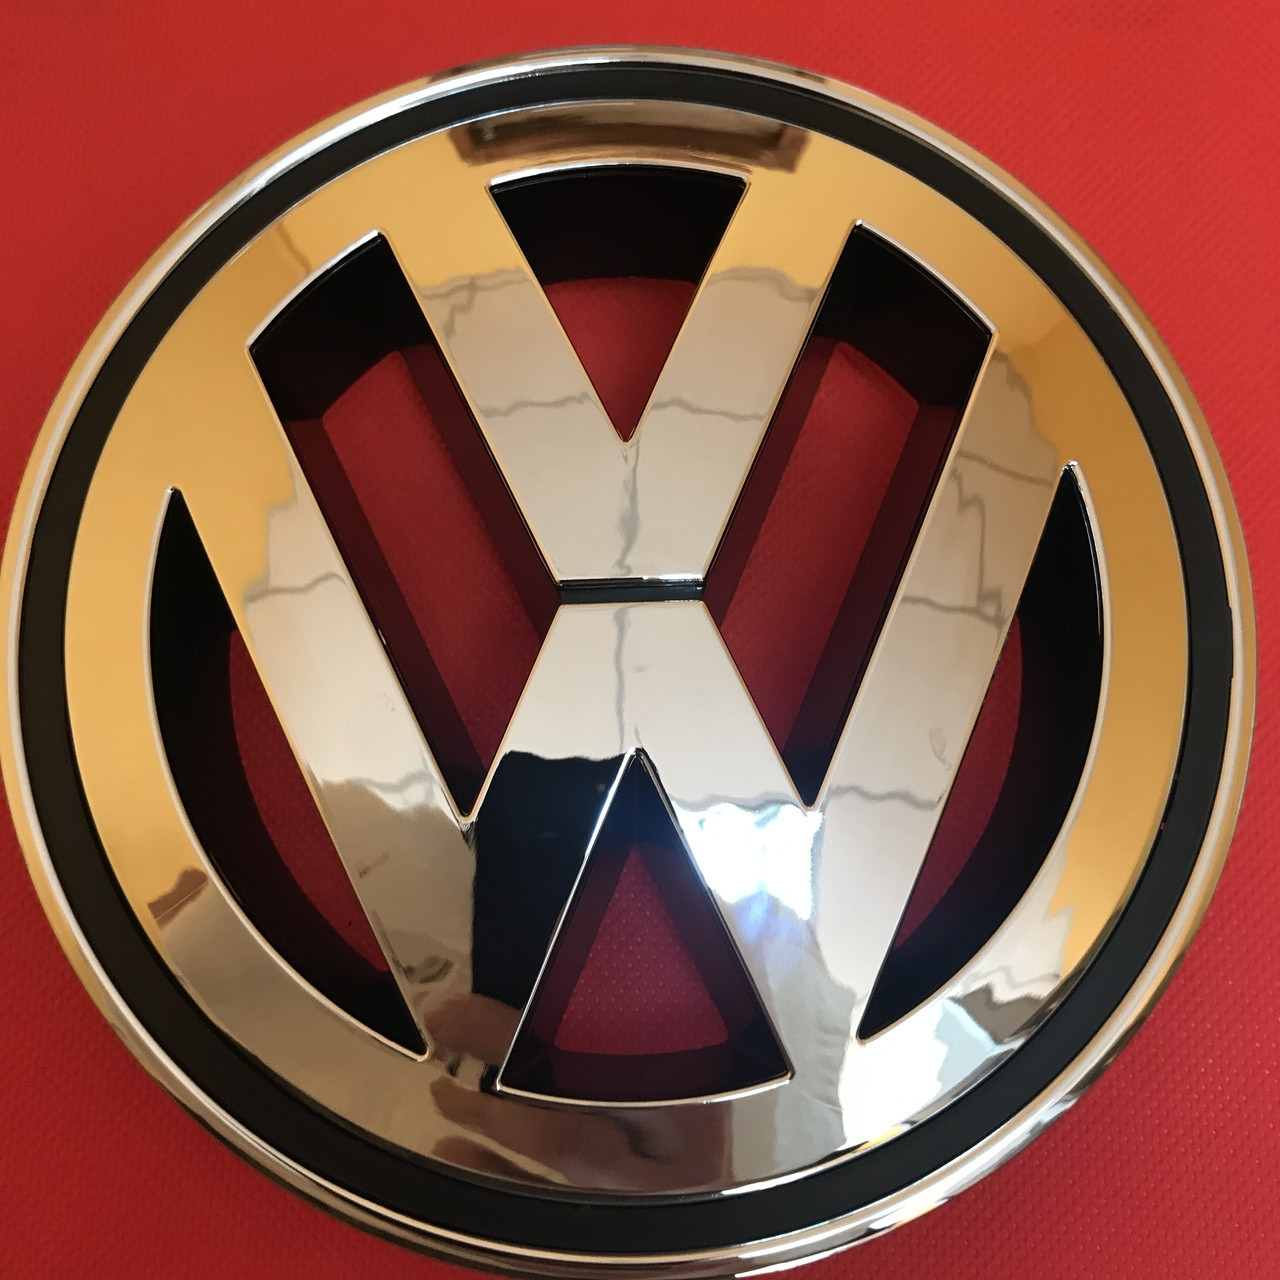 Эмблема логотип Volkswagen Фольксваген Пассат  VW Passat B6 ,CC 2006-2011 на решетку радиатора ,1K5853600